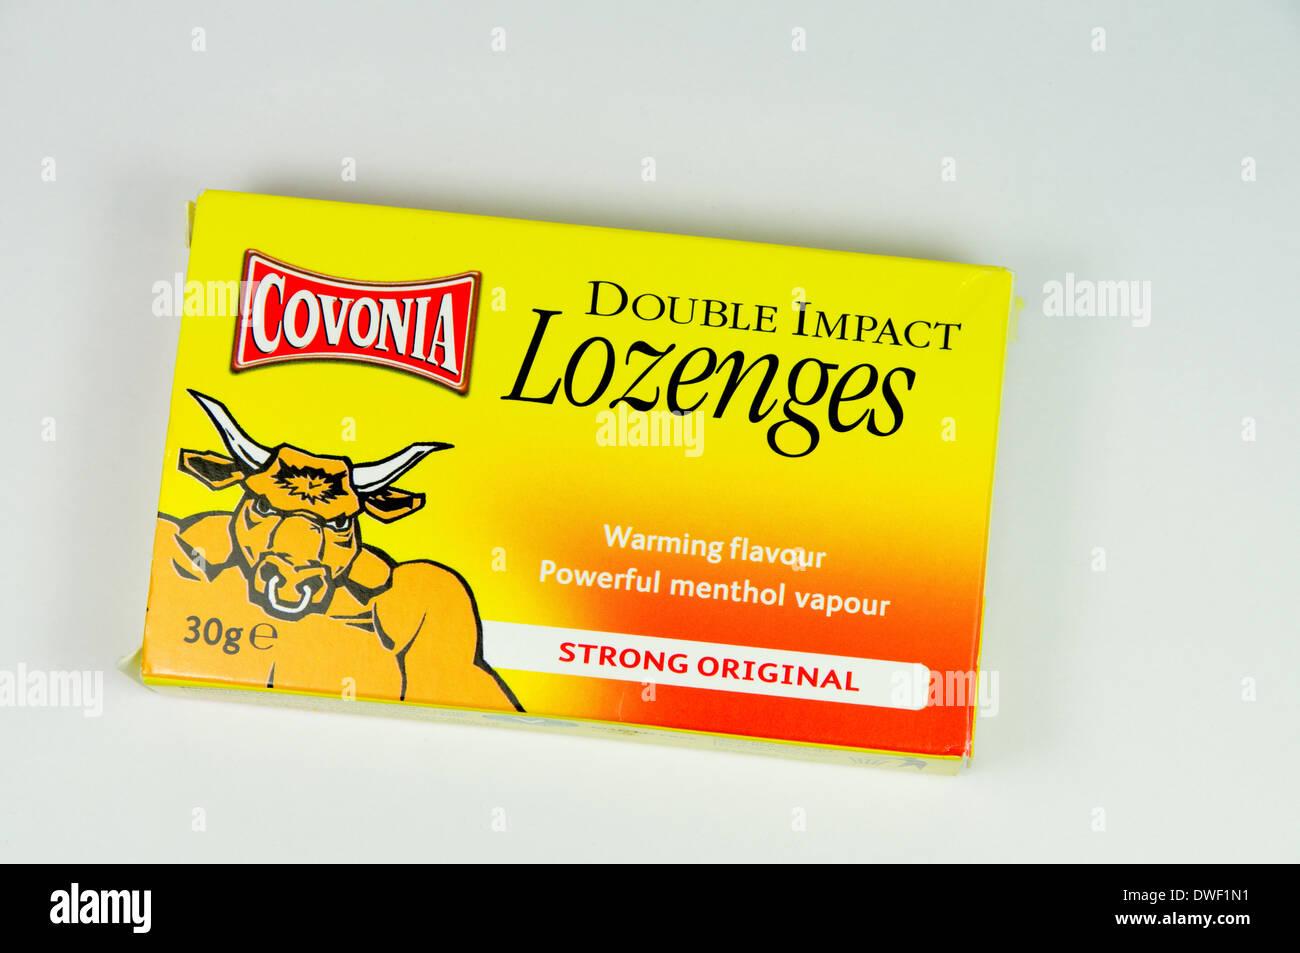 Covonia Lozenges Stock Photo